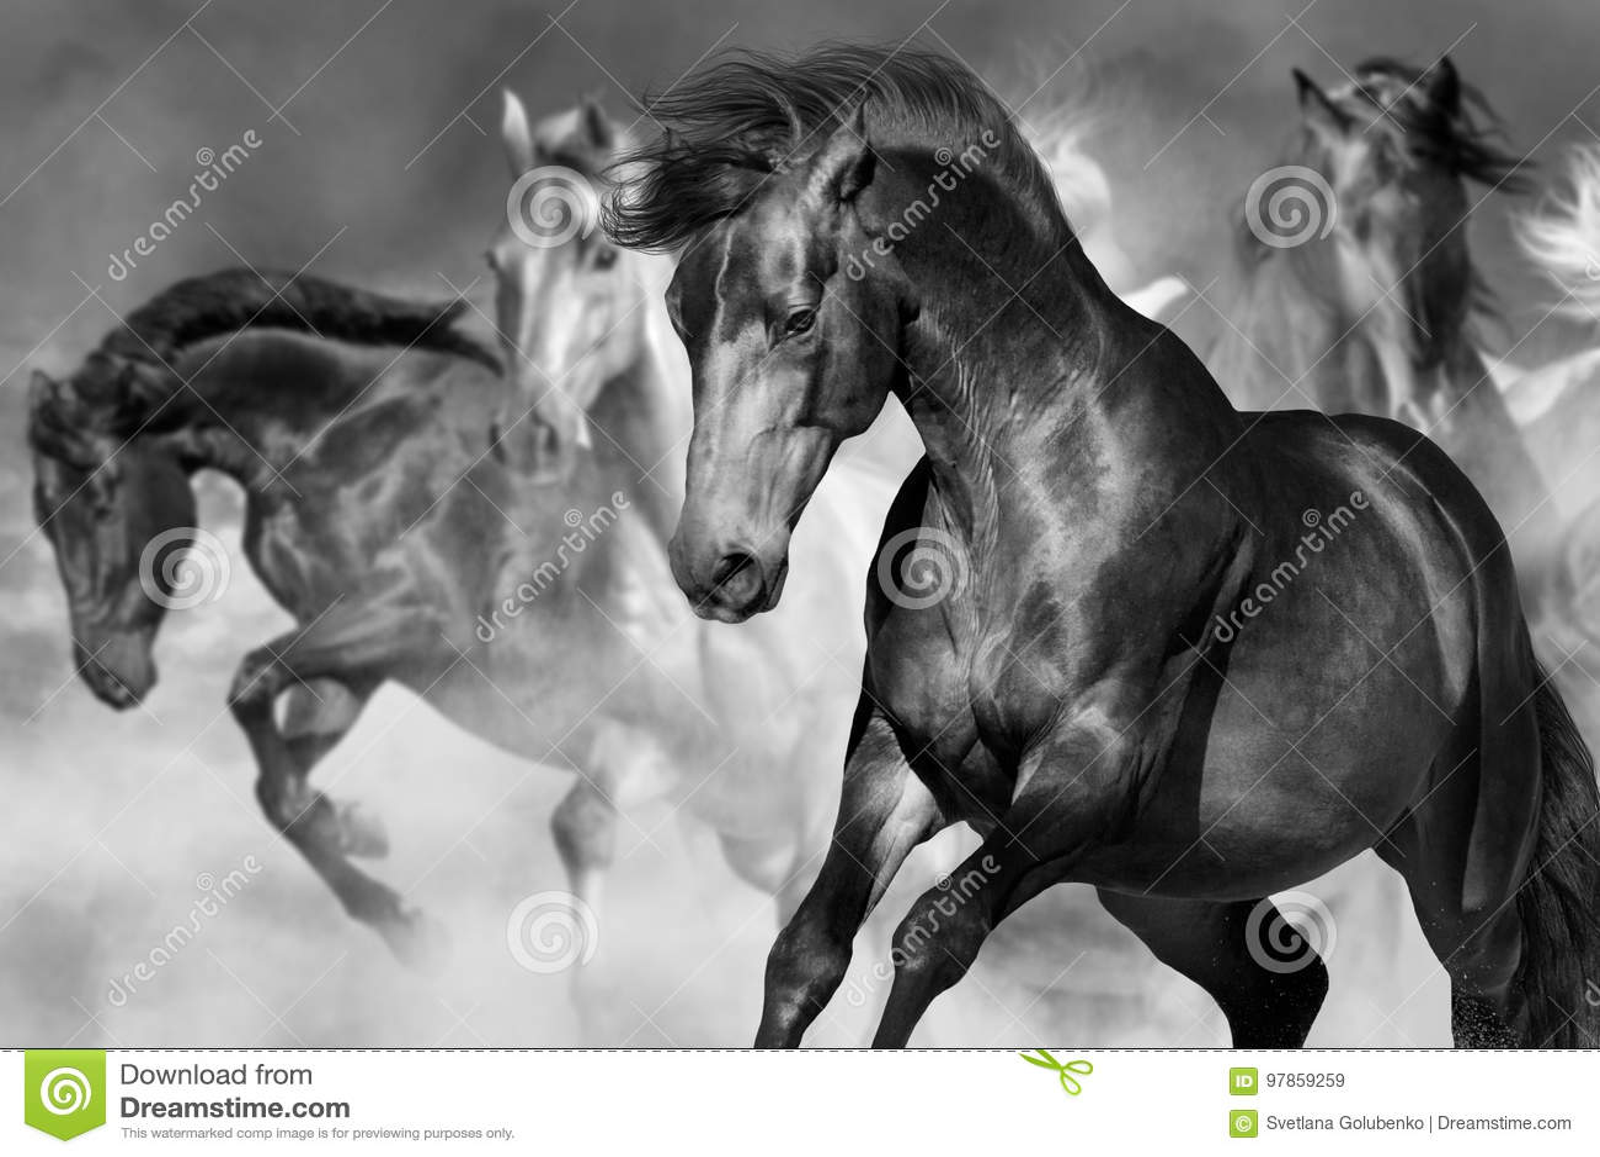 Horse portrait in motion